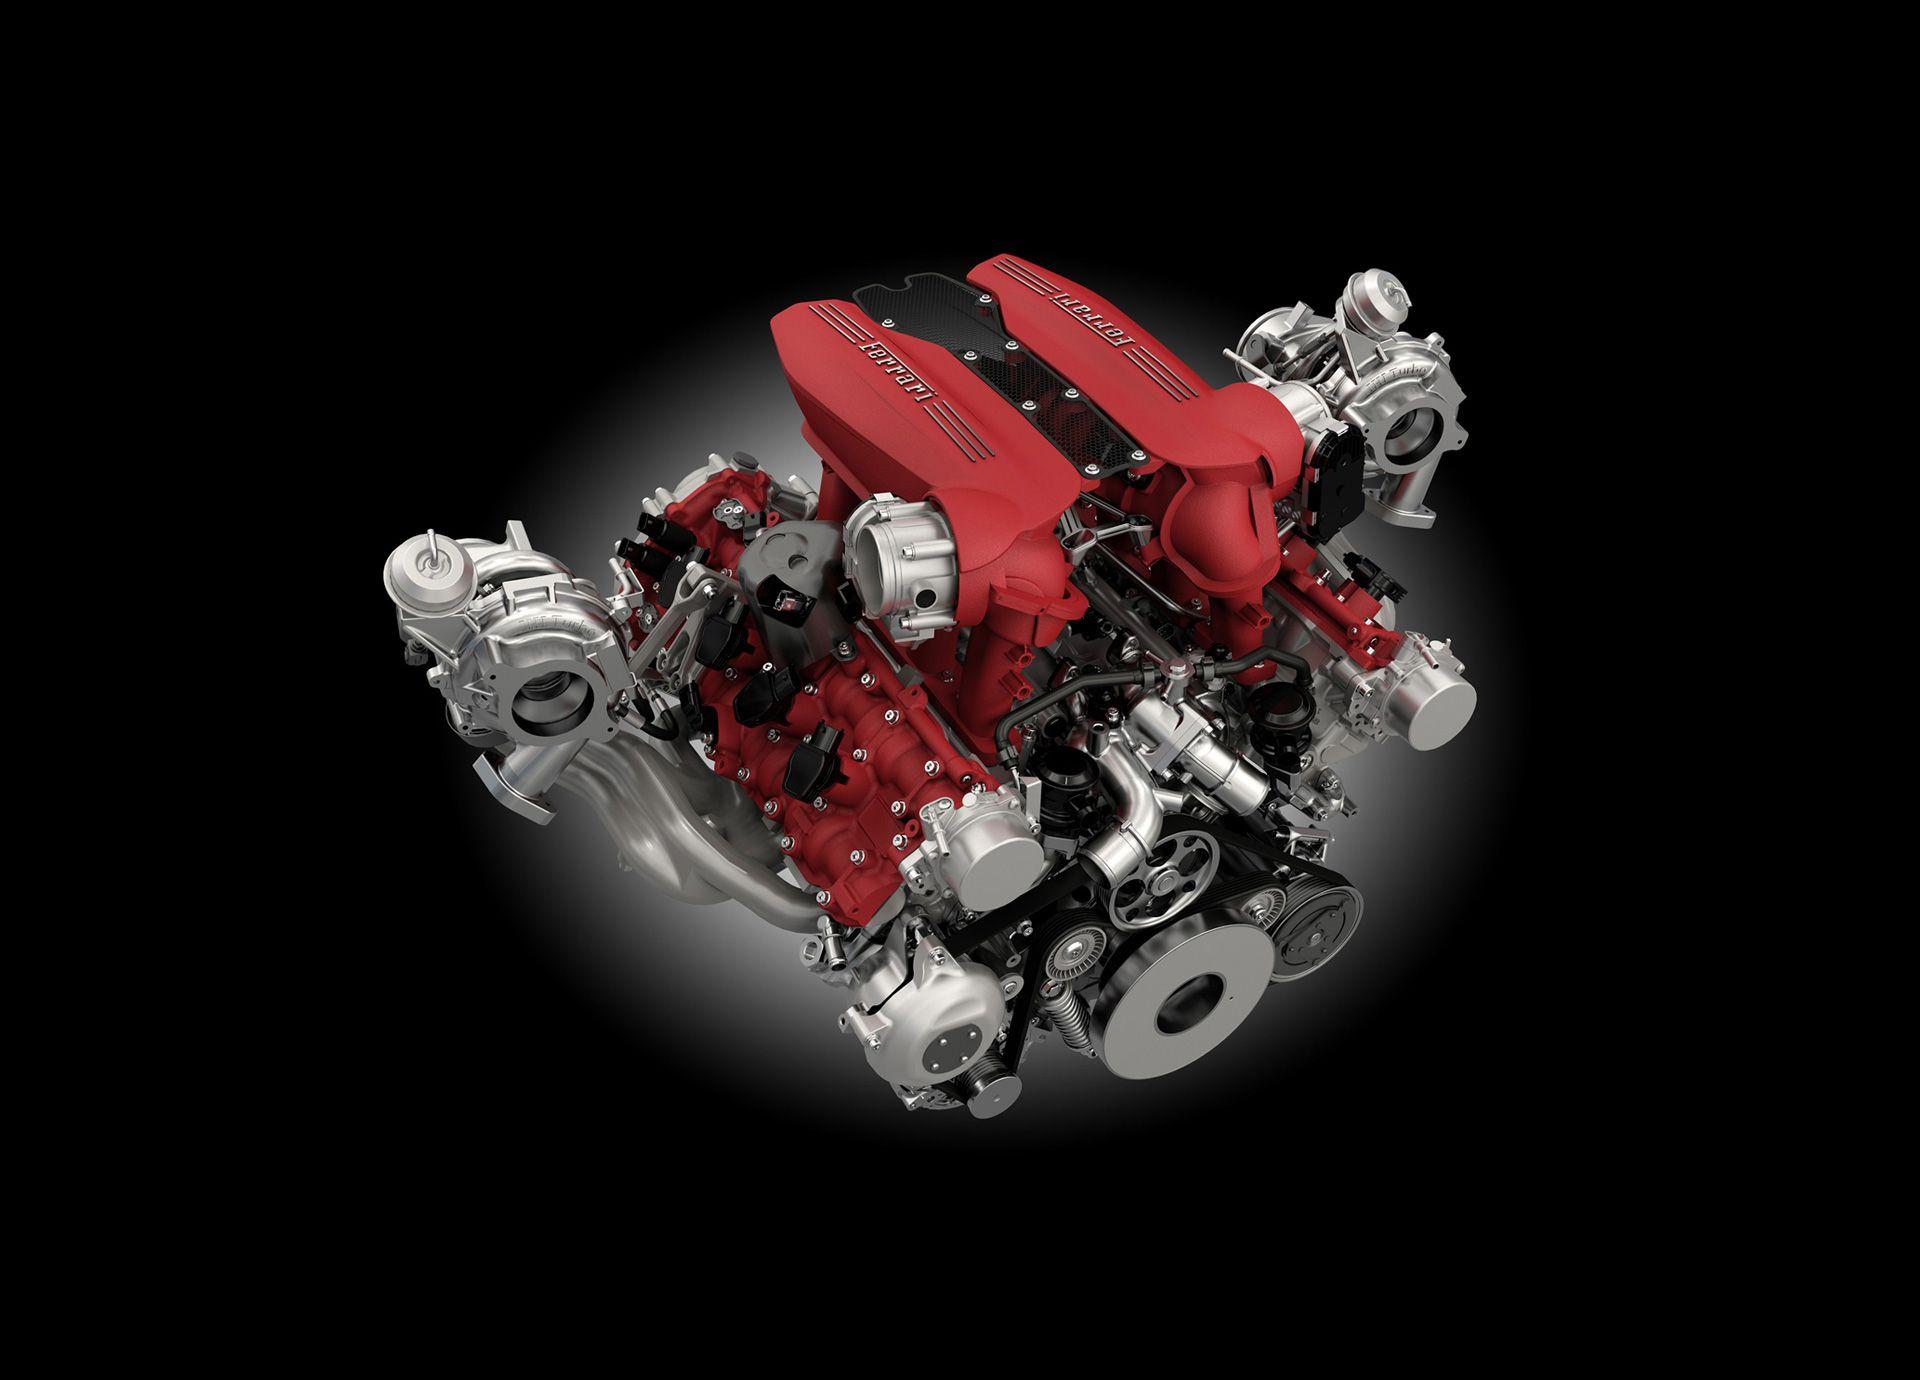 Ferrari F154 Engine